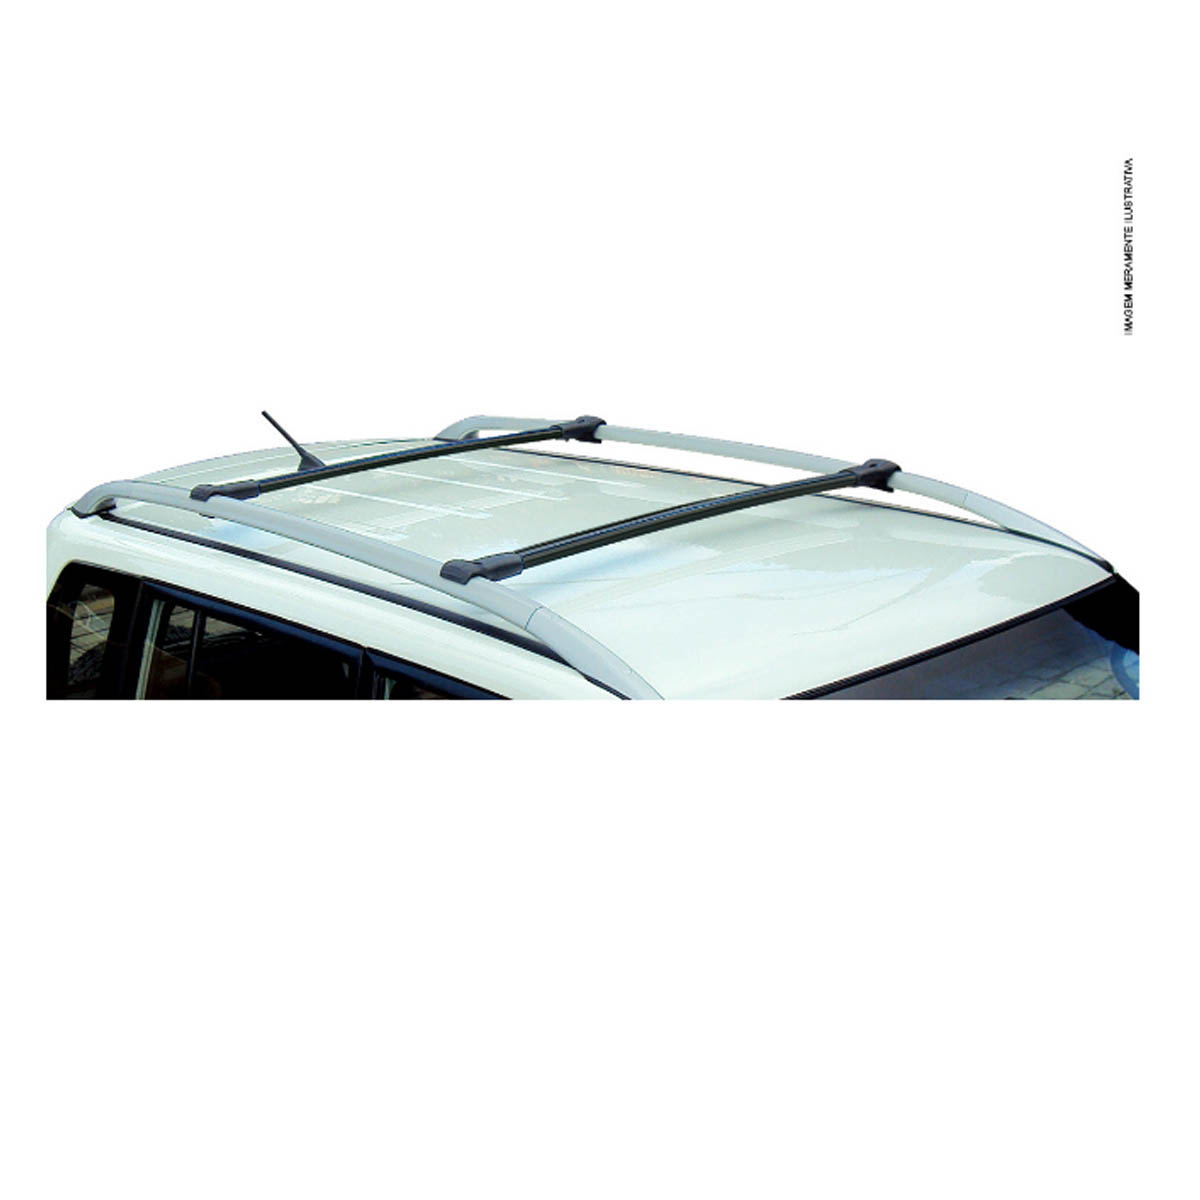 Travessa rack de teto larga preta alumínio Nova S10 cabine dupla 2012 a 2021